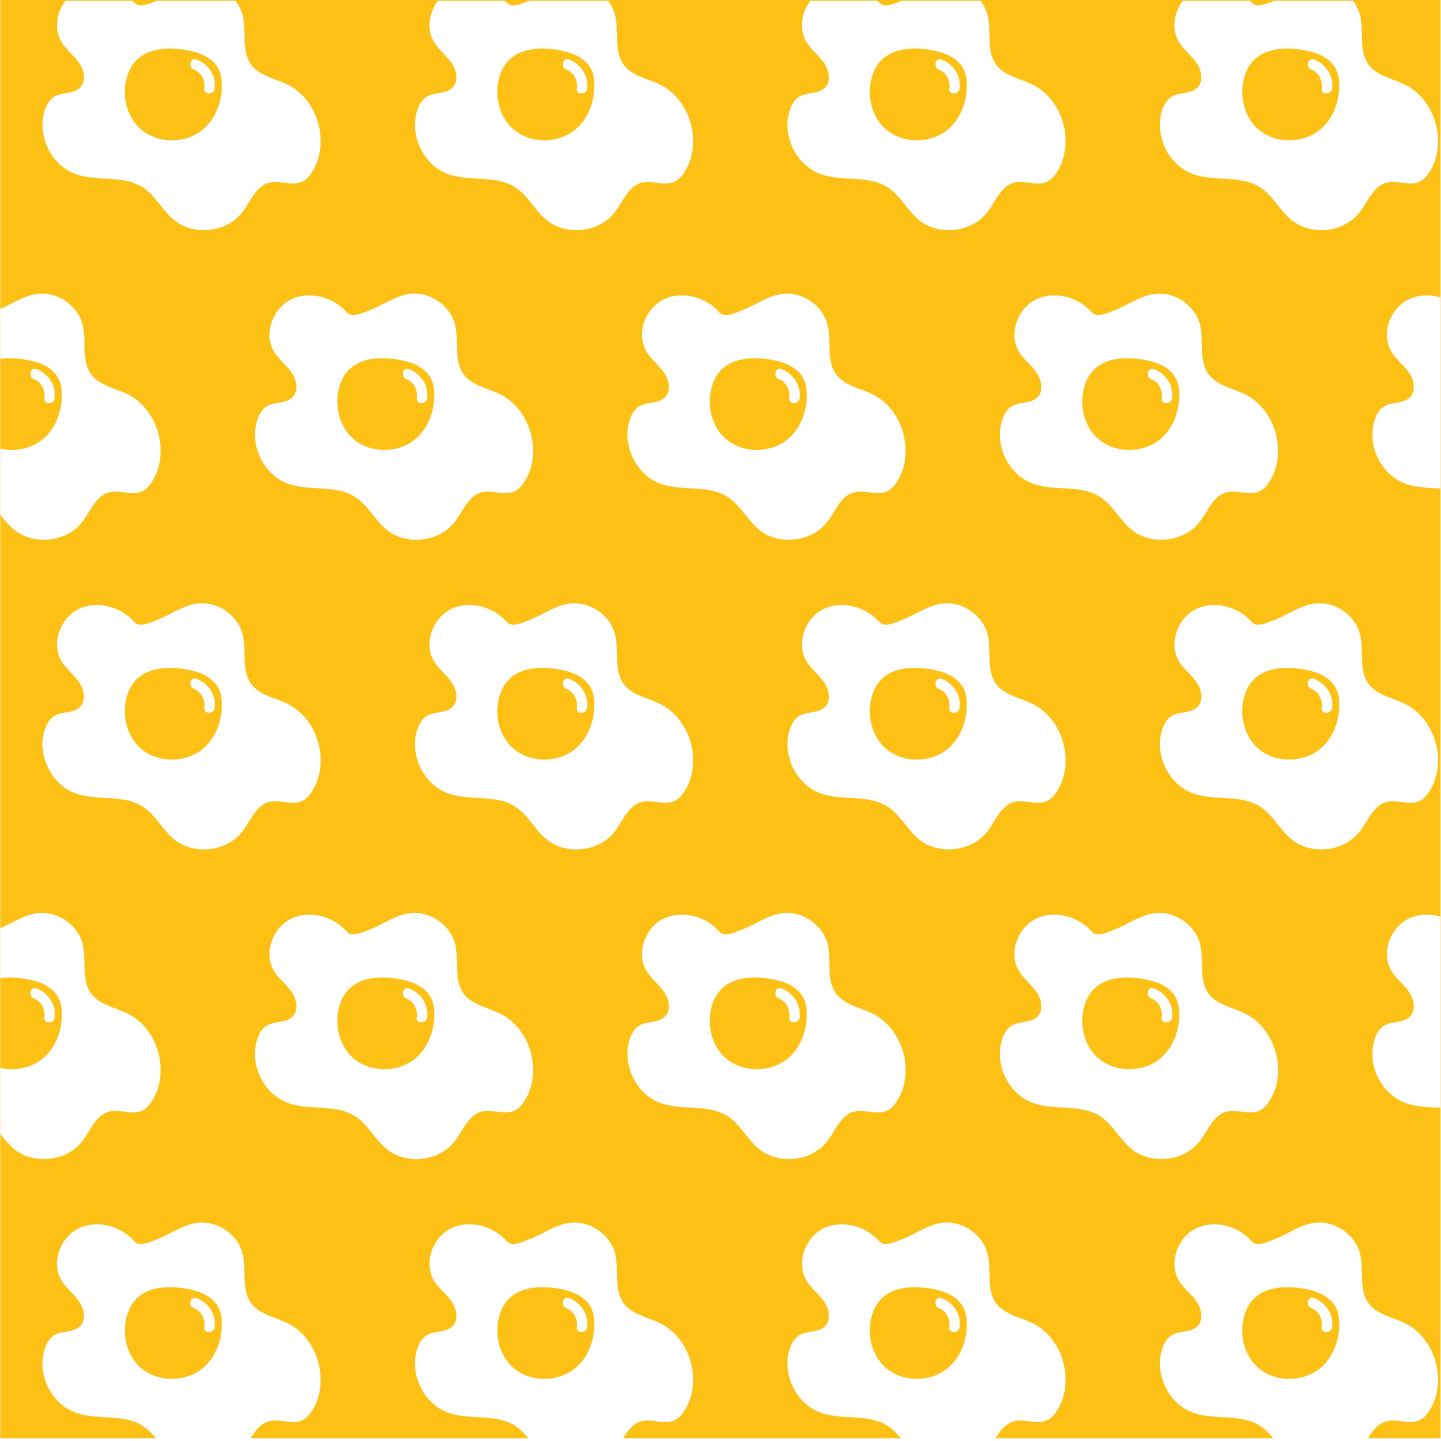 egg_pattern.png